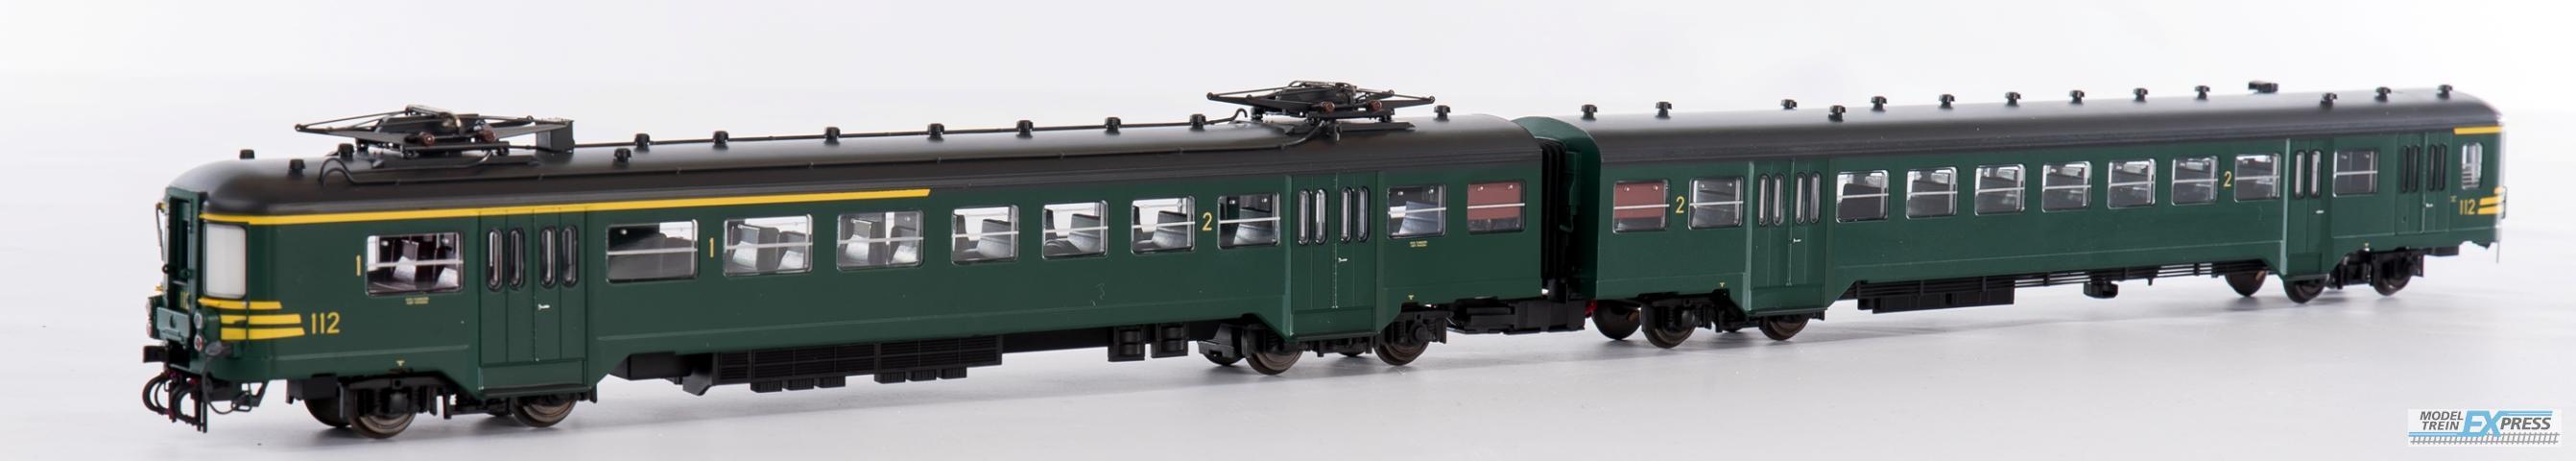 B-Models 7002.05L